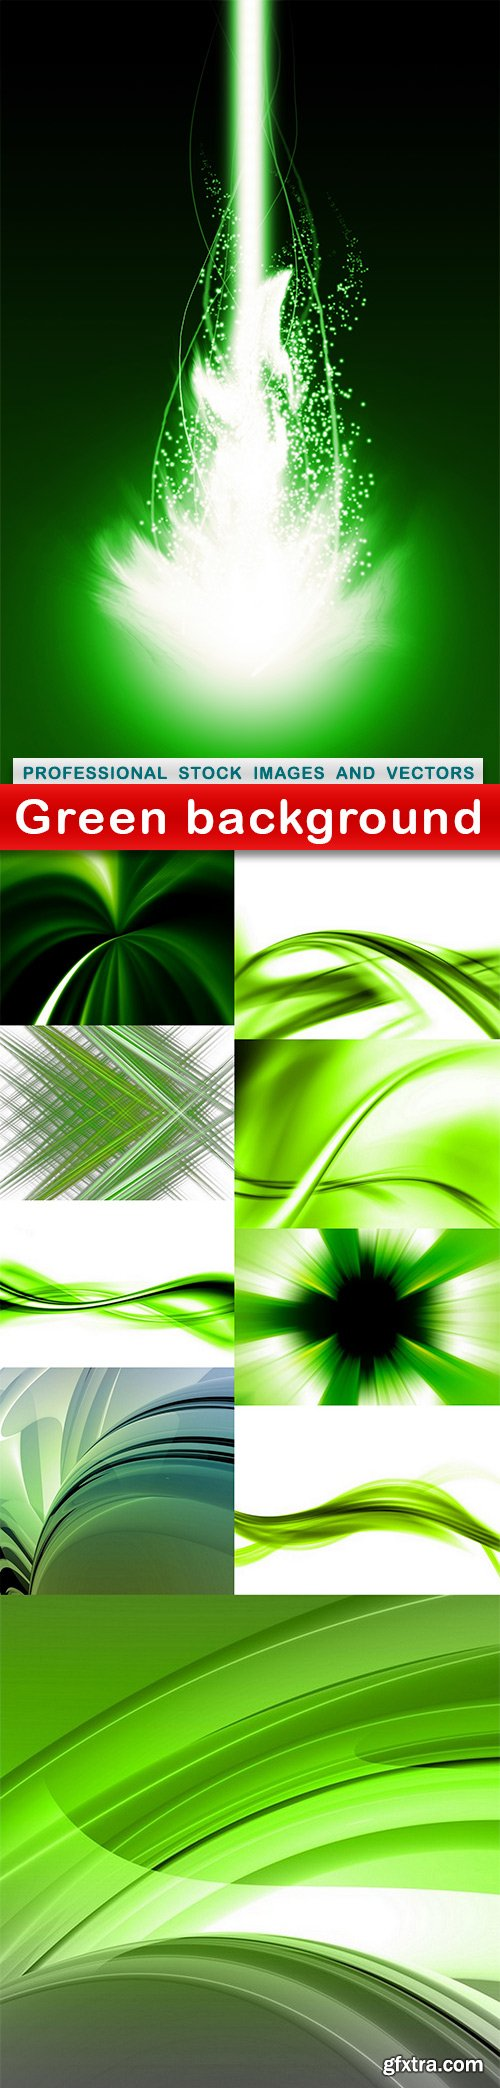 Green background - 11 UHQ JPEG